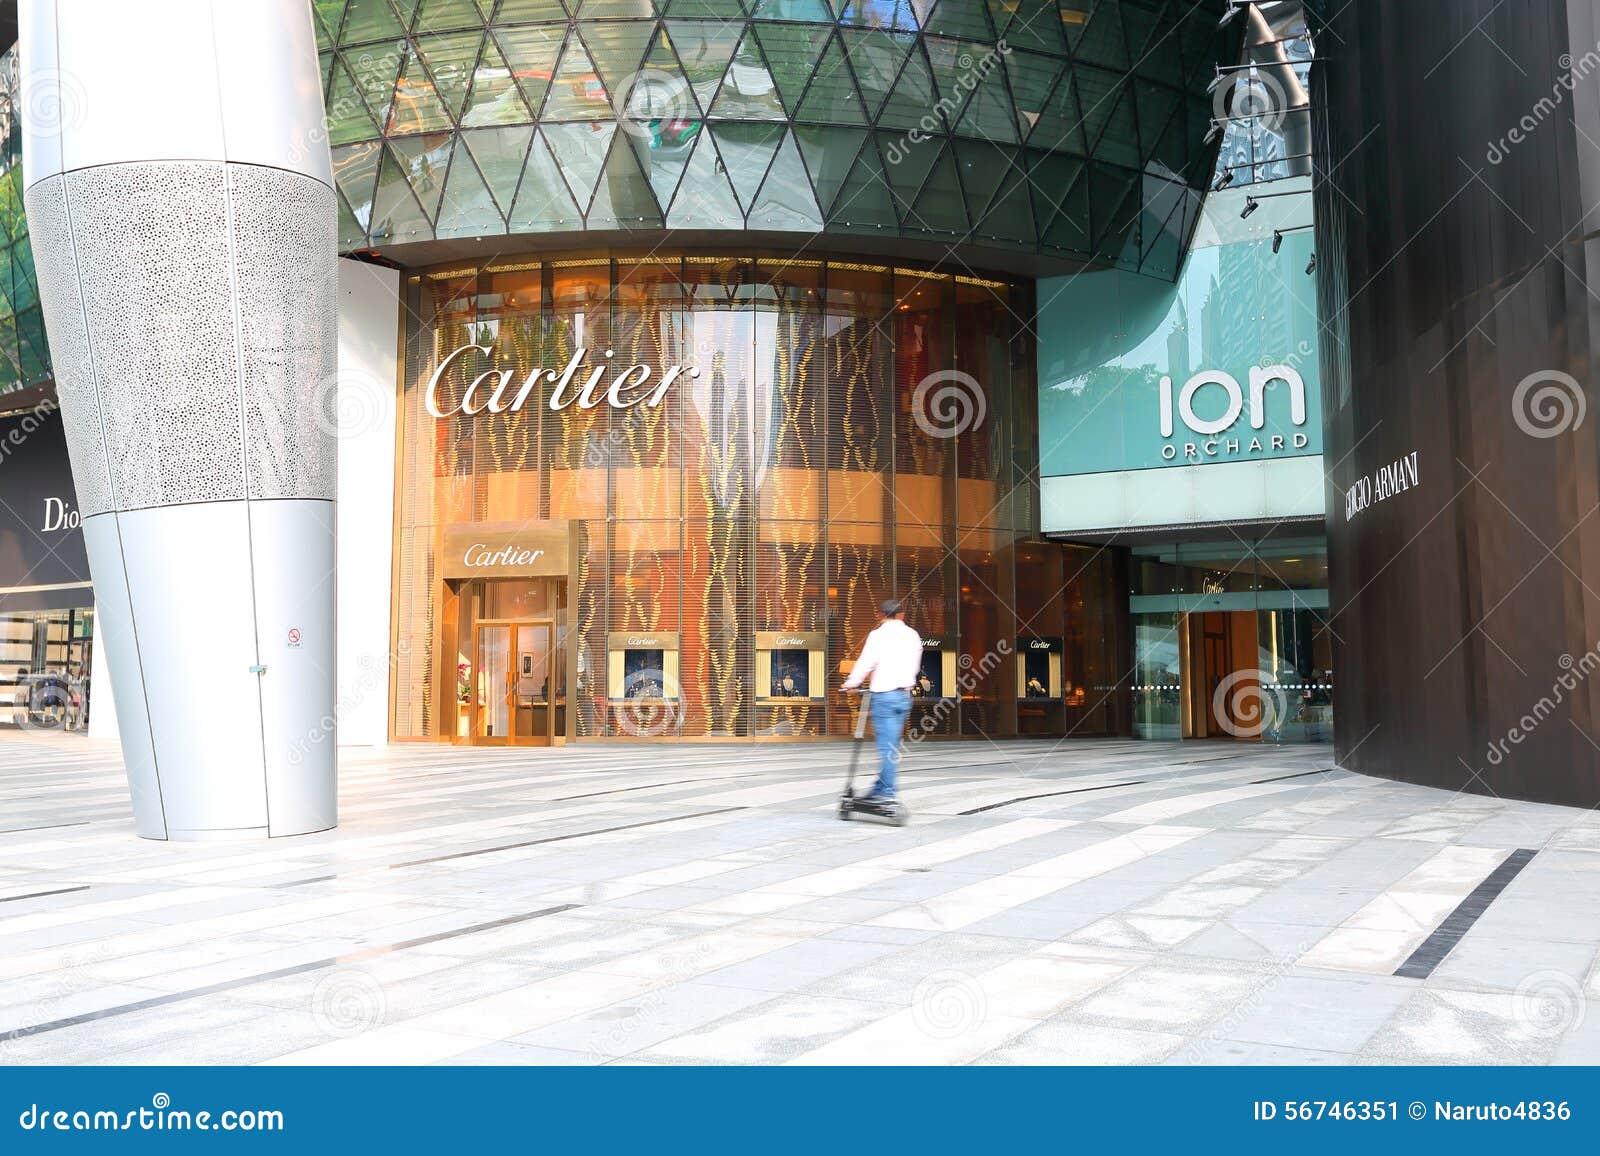 cartier singapore outlets ed4h  cartier stores singapore